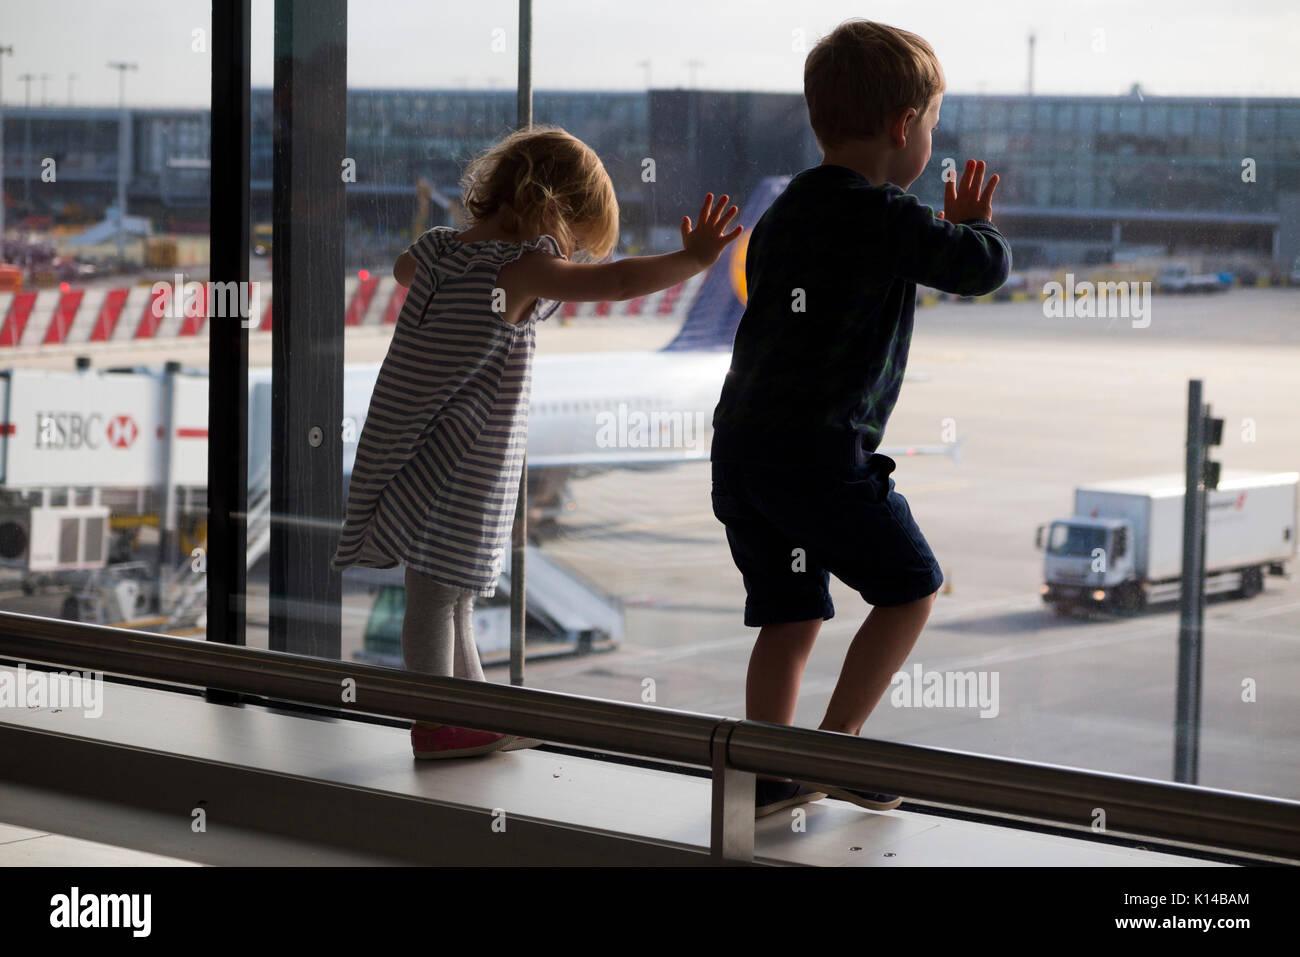 Children wave goodbye to departing aircraft at London Heathrow airport, Terminal 2. UK. (89) - Stock Image